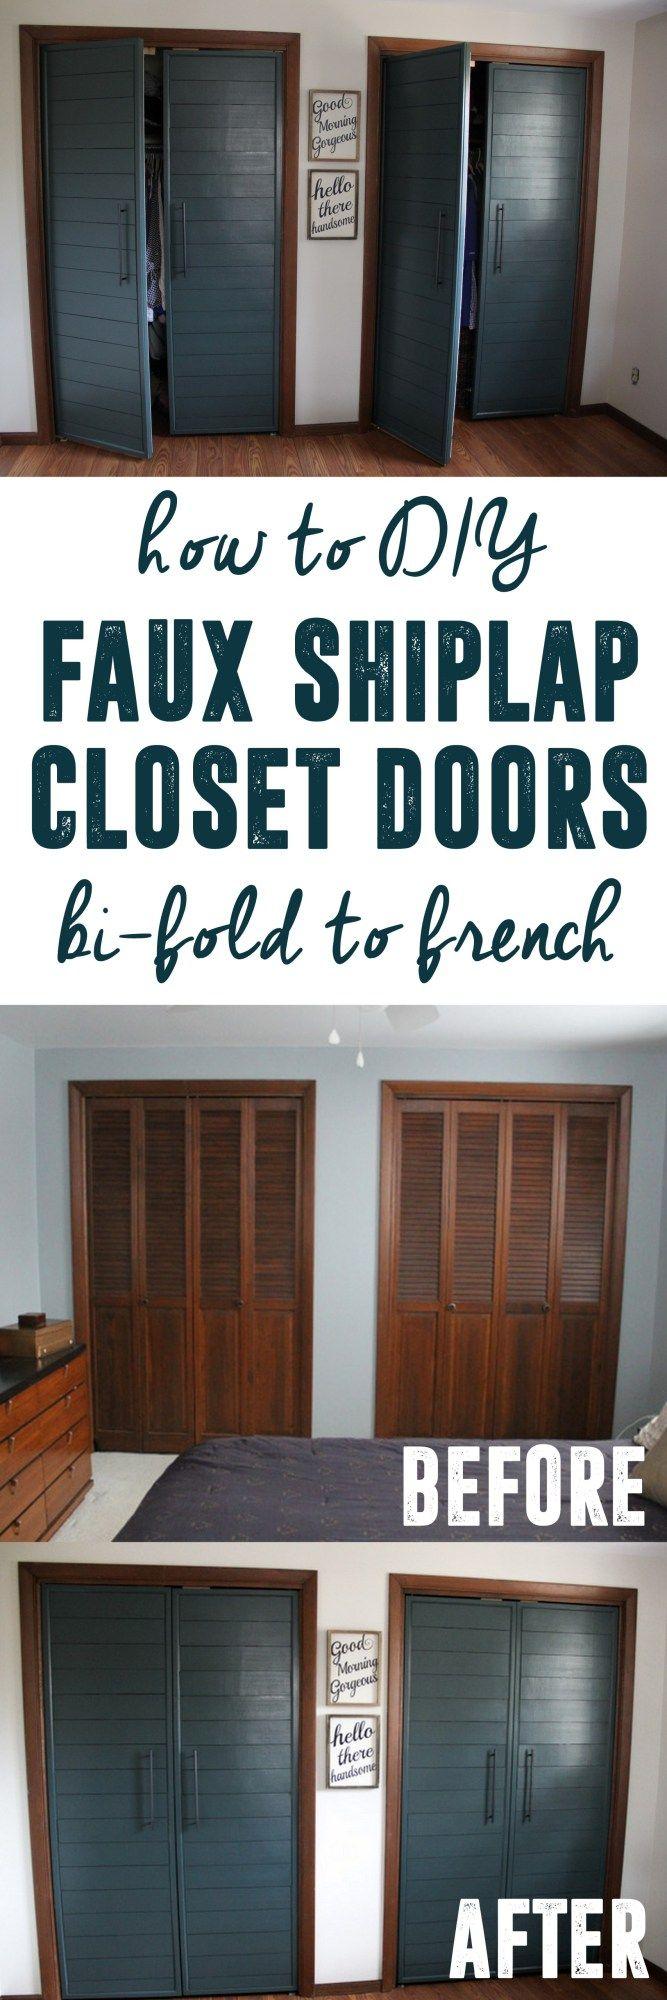 Best 25 diy internal french doors ideas on pinterest interior bi fold to faux shiplap french closet doors rubansaba